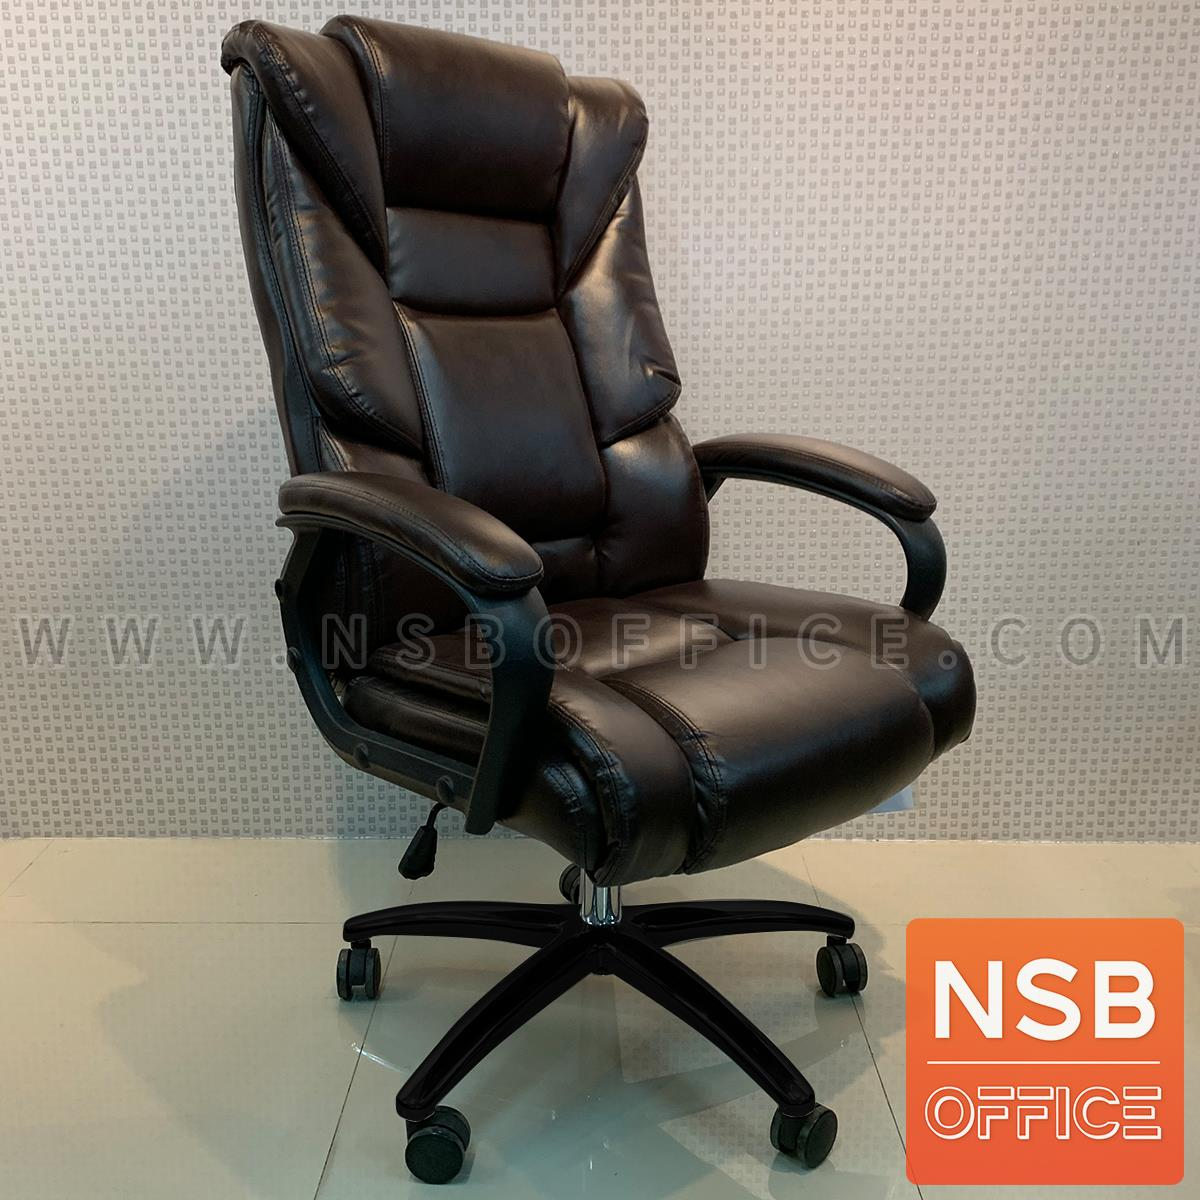 B01A395:เก้าอี้ผู้บริหาร รุ่น Cornell (ตอร์เนลล์)  โช๊คแก๊ส มีก้อนโยก ขาอลูมิเนียมสีดำ